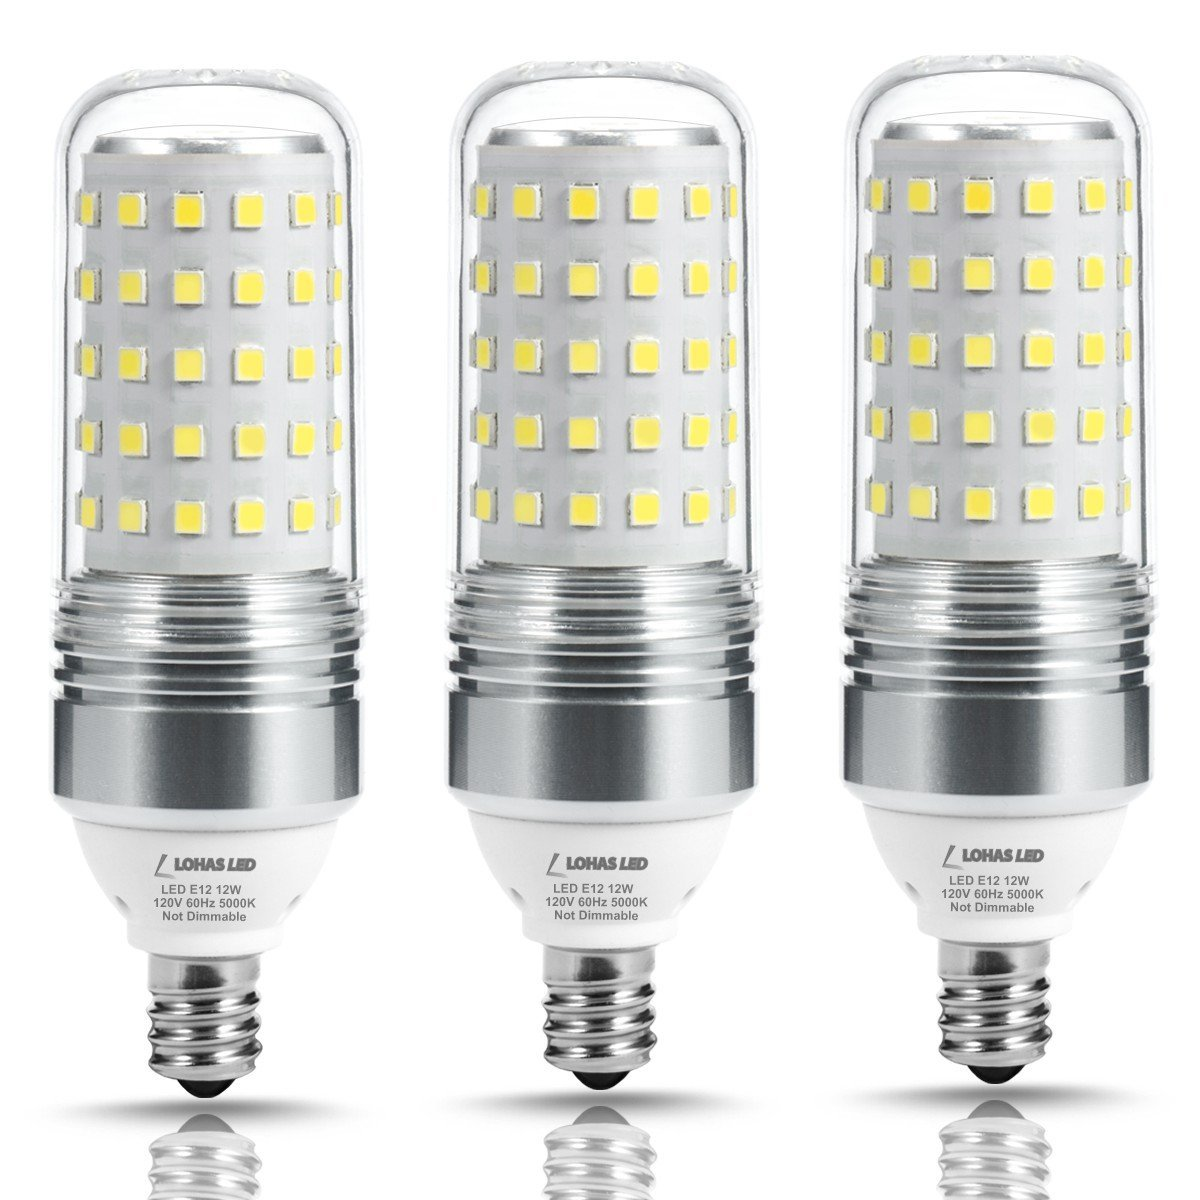 LOHAS 100W Equivalent LED Candelabra Light Bulbs,12W LED